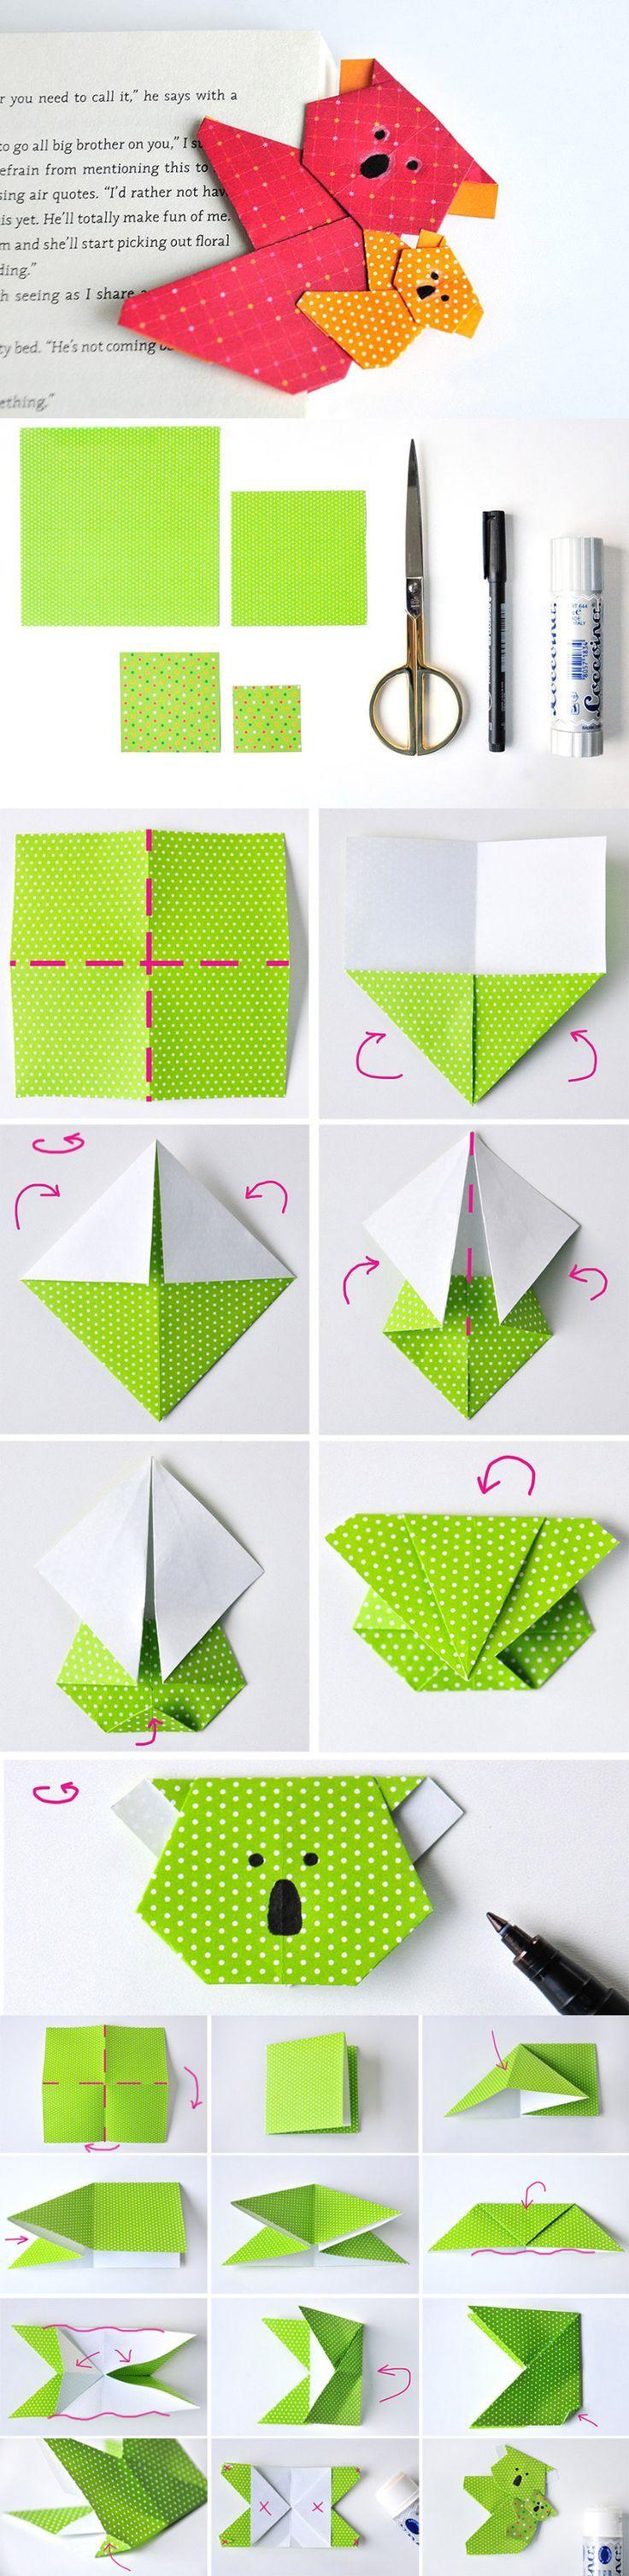 DIY Koala Origami – easily fold bookmarks yourself